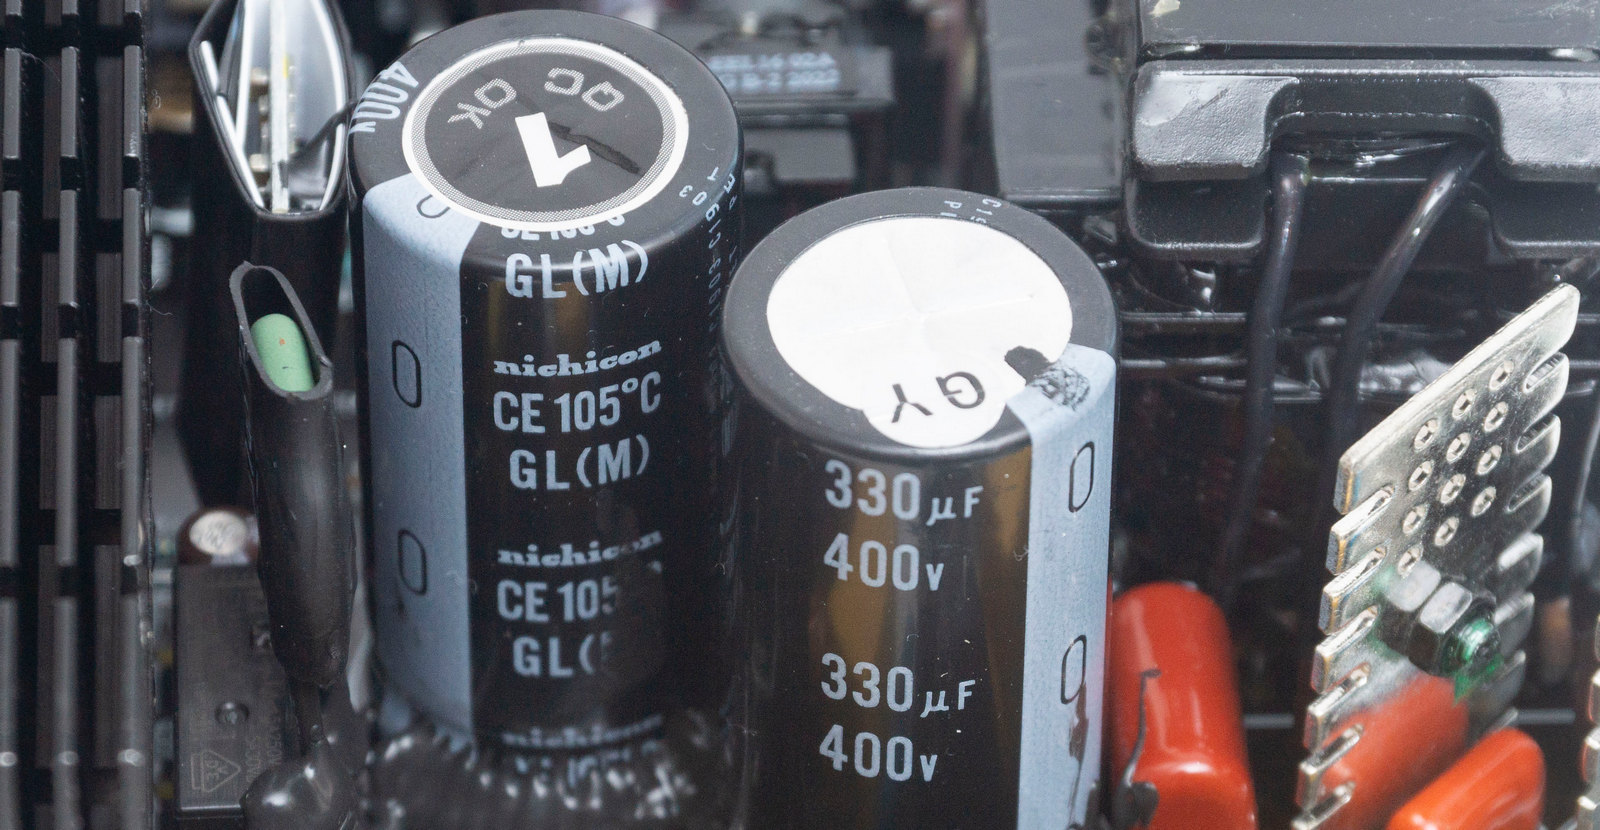 2eb6f178032a16cc310d4c58337aefbc.JPG